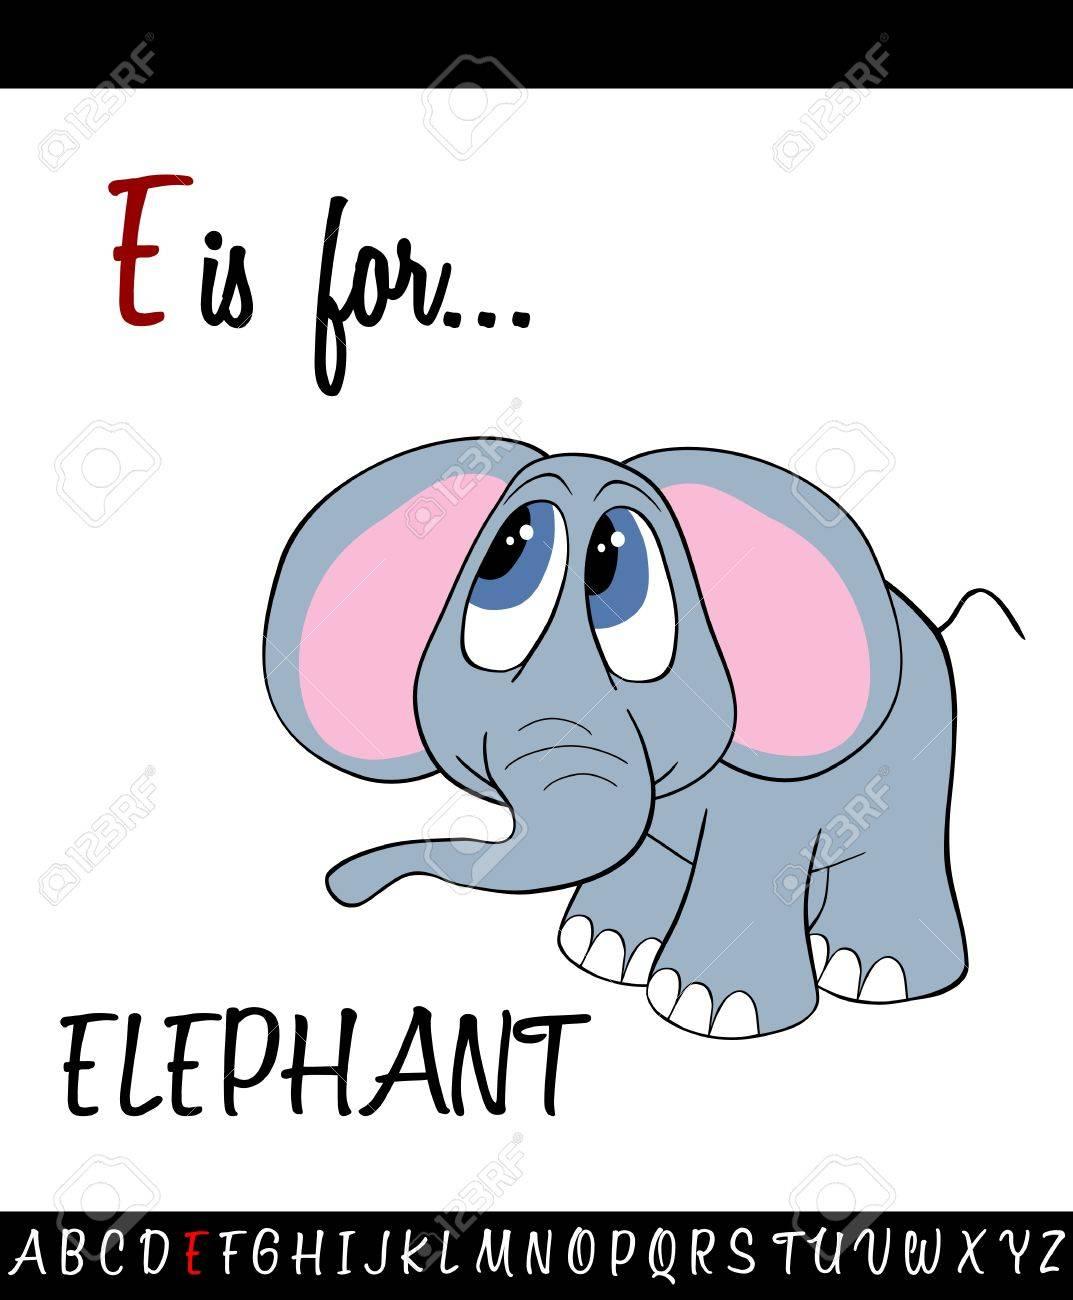 Illustriertes Vokabular Arbeitsblatt Mit Cartoon ELEPHANT Für Kinder ...